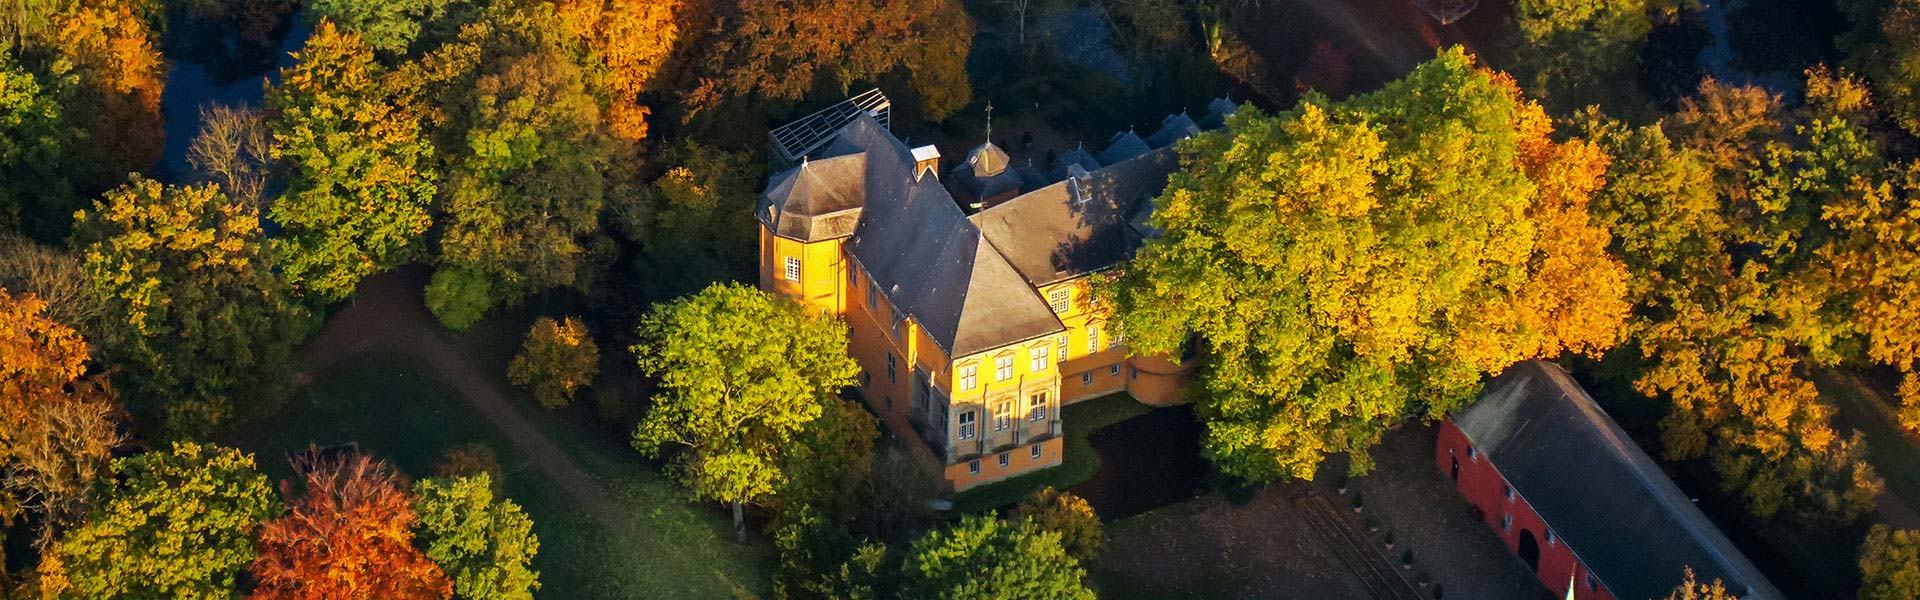 Schloss Rheydt-Mönchengladbach